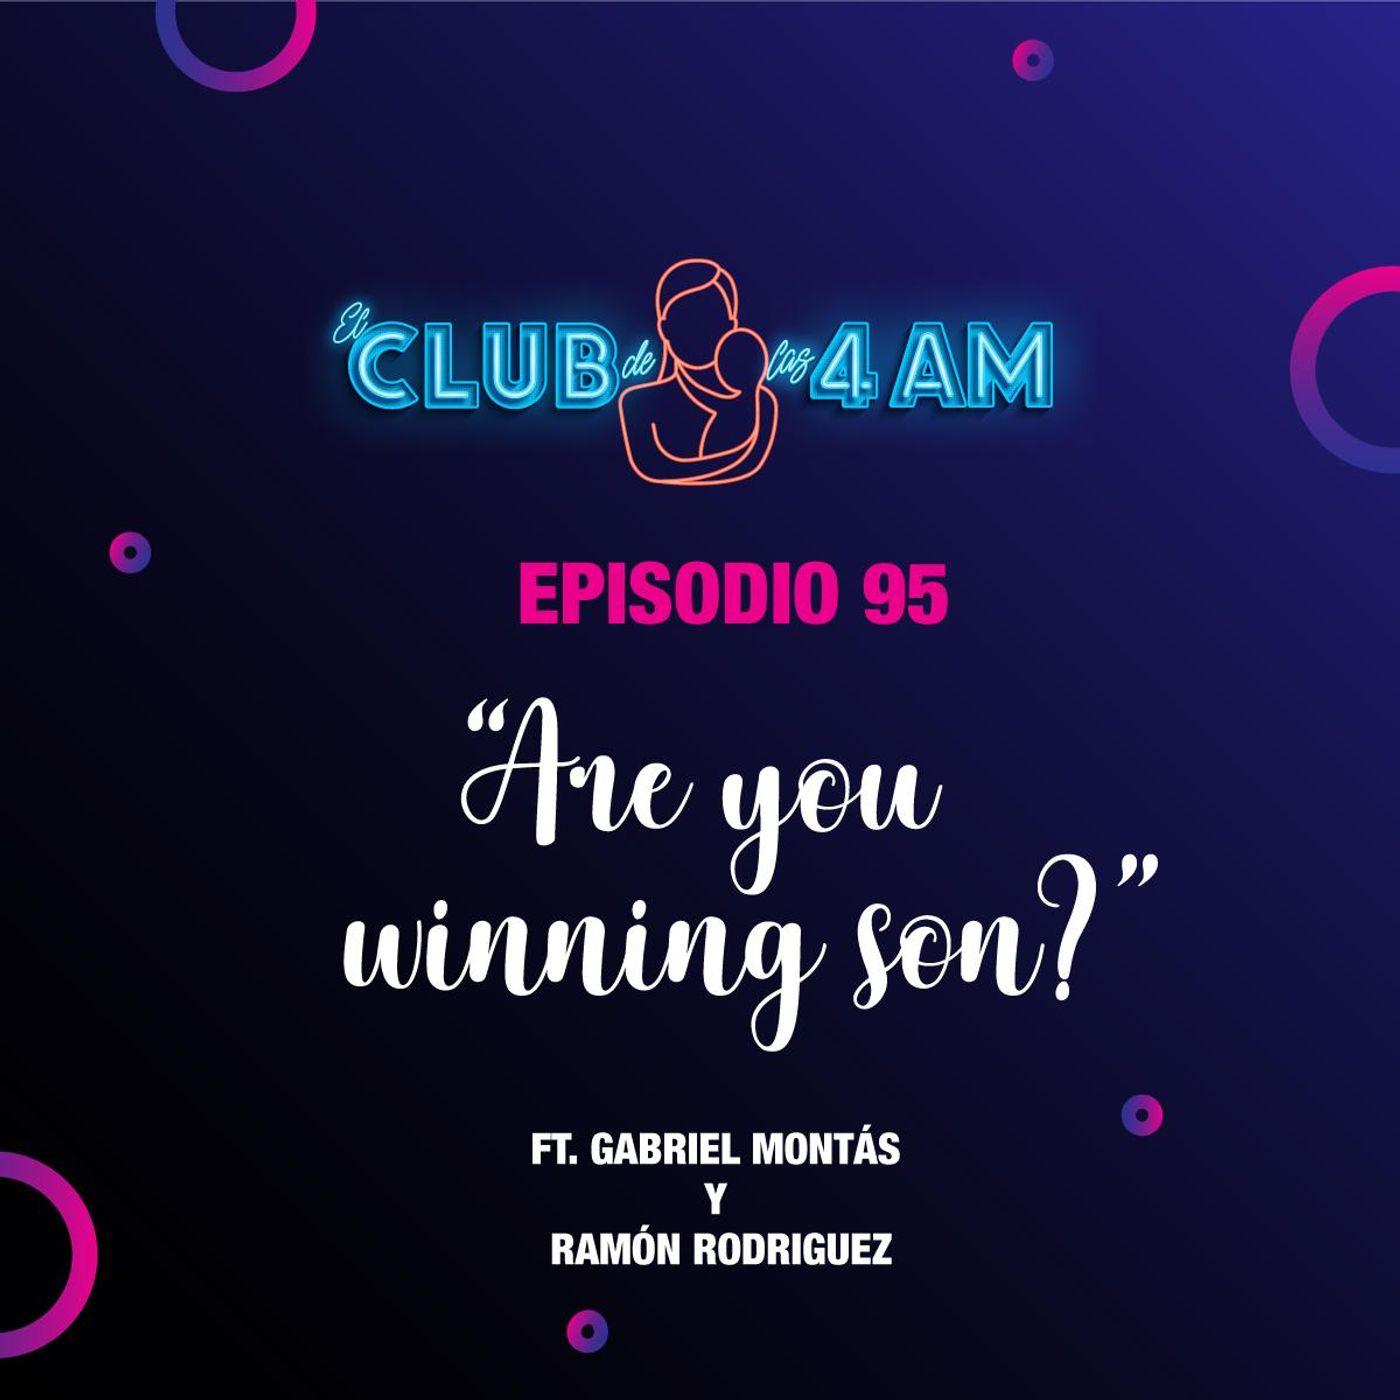 95. Are you winning son? 👾 [ft. Gabriel Montás y Ramón Rodríguez]